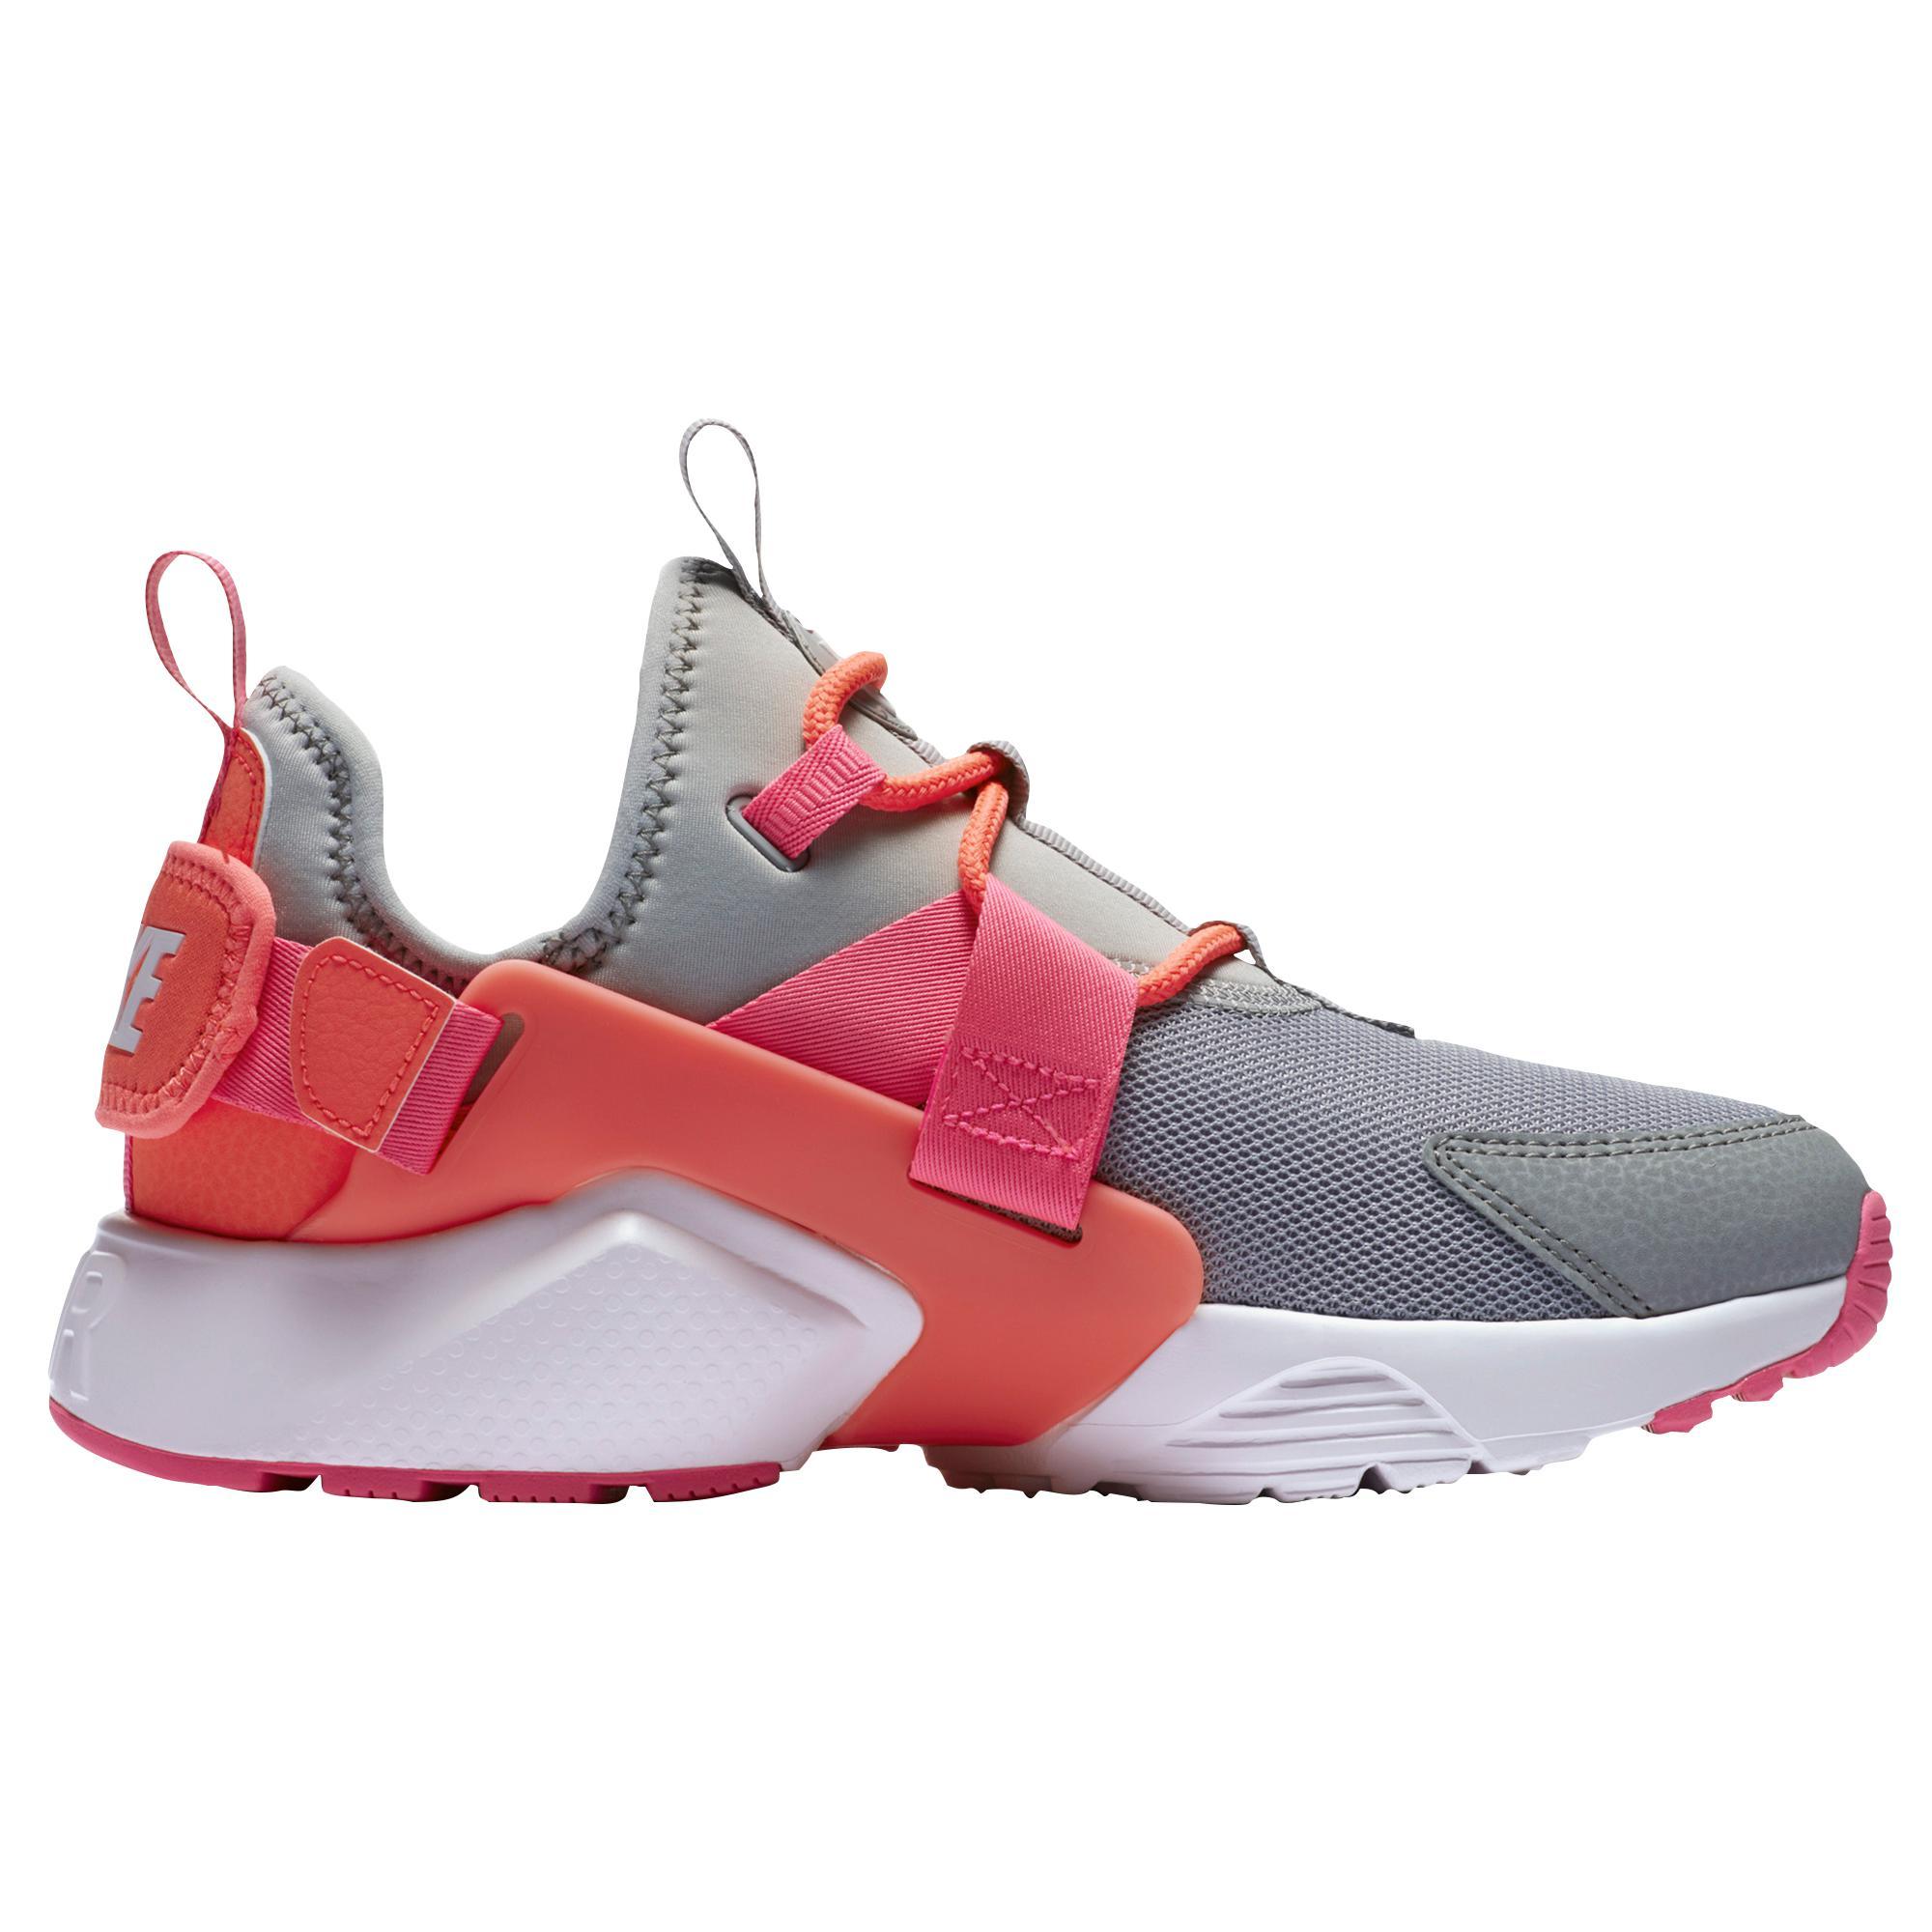 online store aaa15 85f7e Nike. Women s Air Huarache City Low